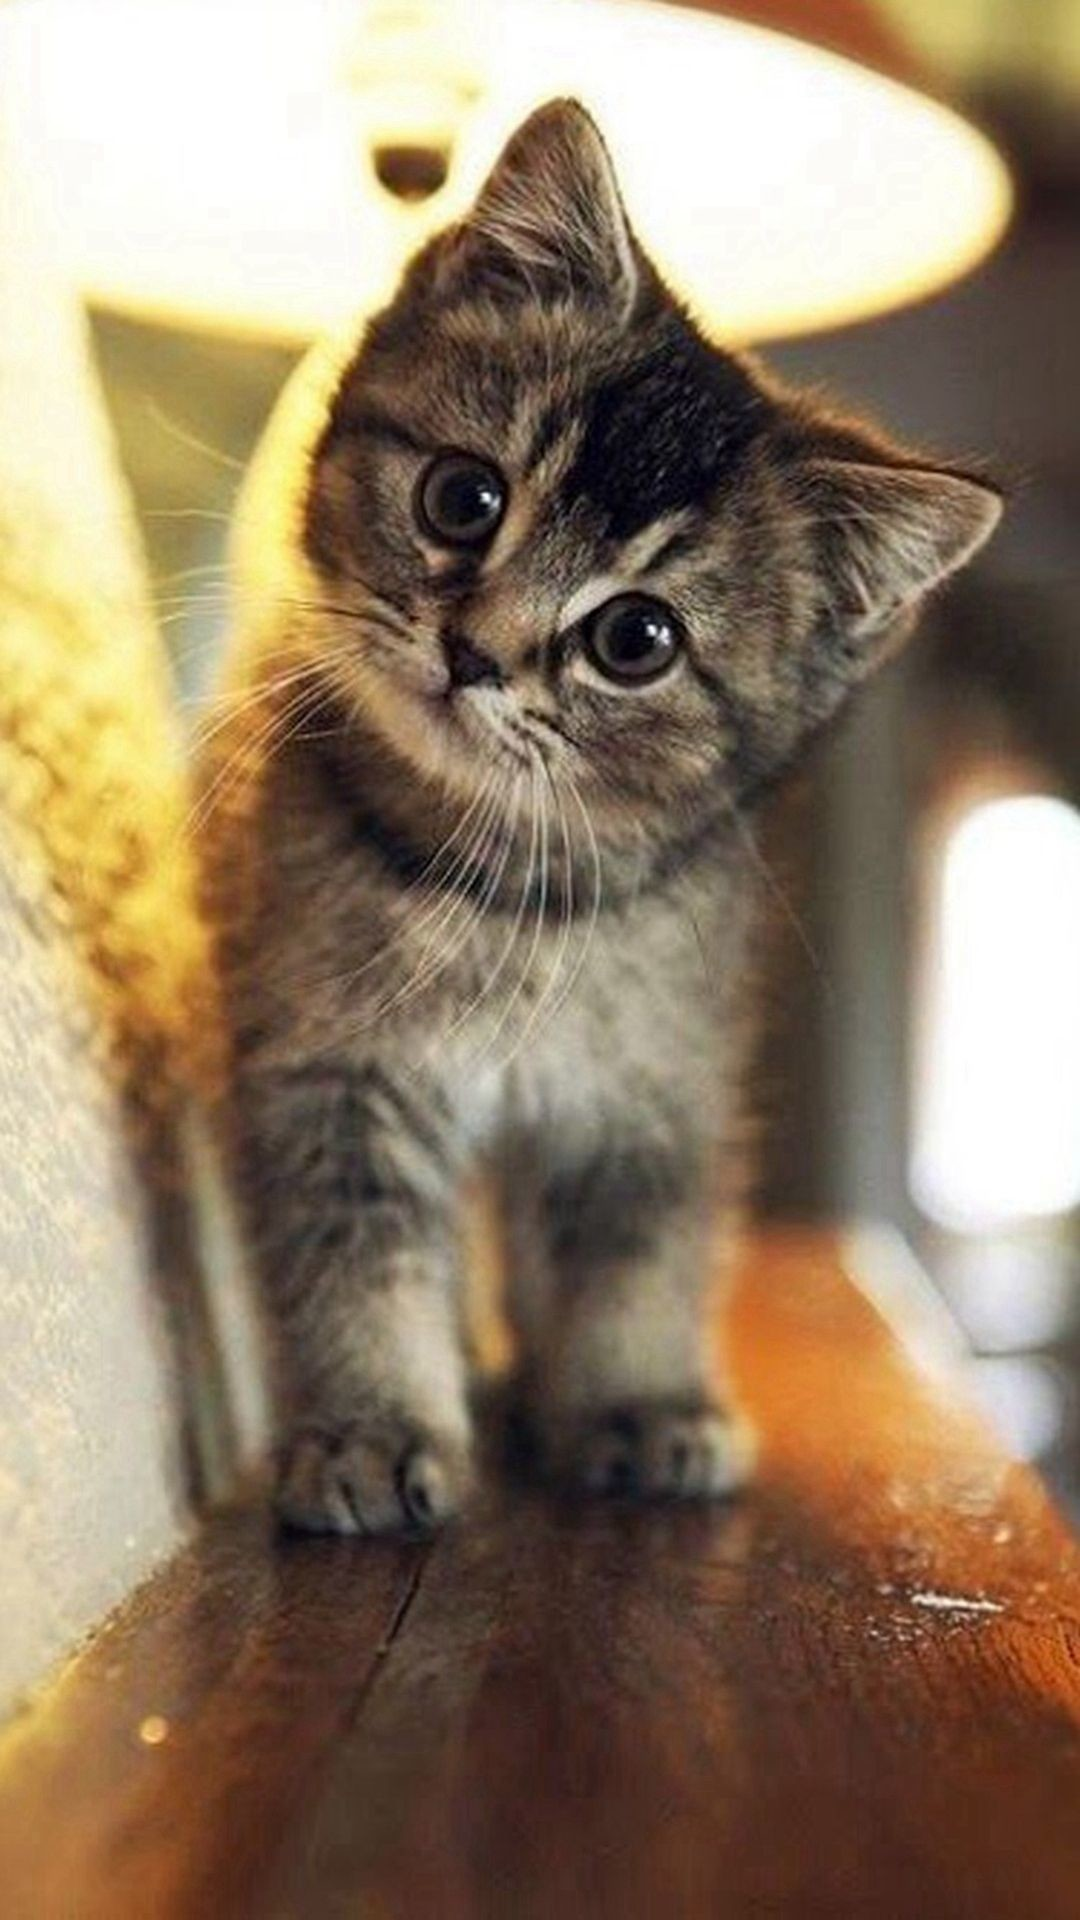 Res: 1080x1920, Cute Cat Wallpaper iPhone - Best iPhone Wallpaper